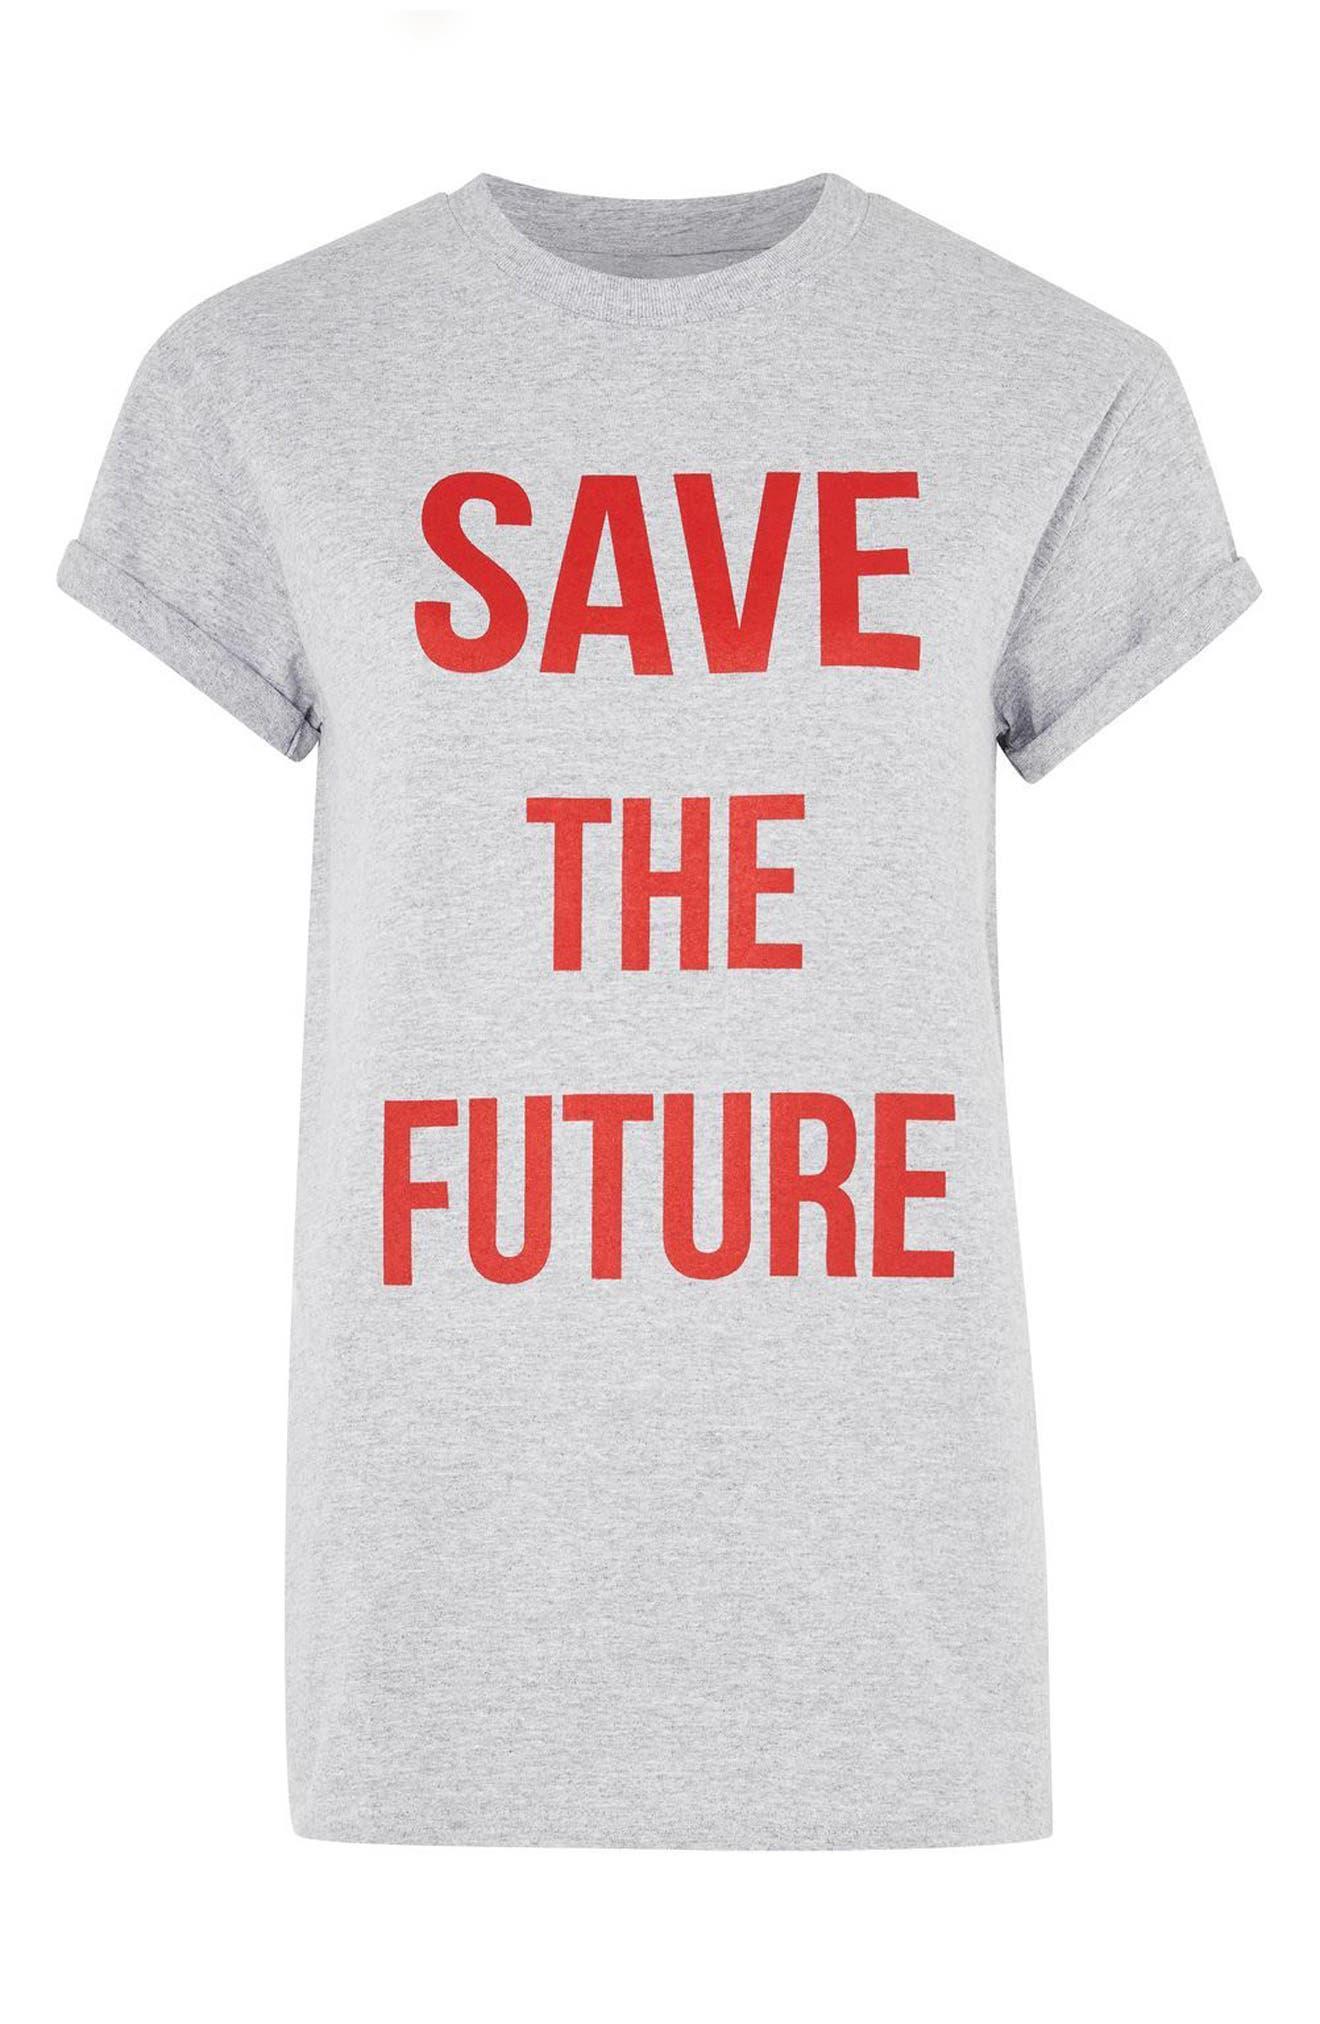 Save the Future Tee,                             Alternate thumbnail 3, color,                             020